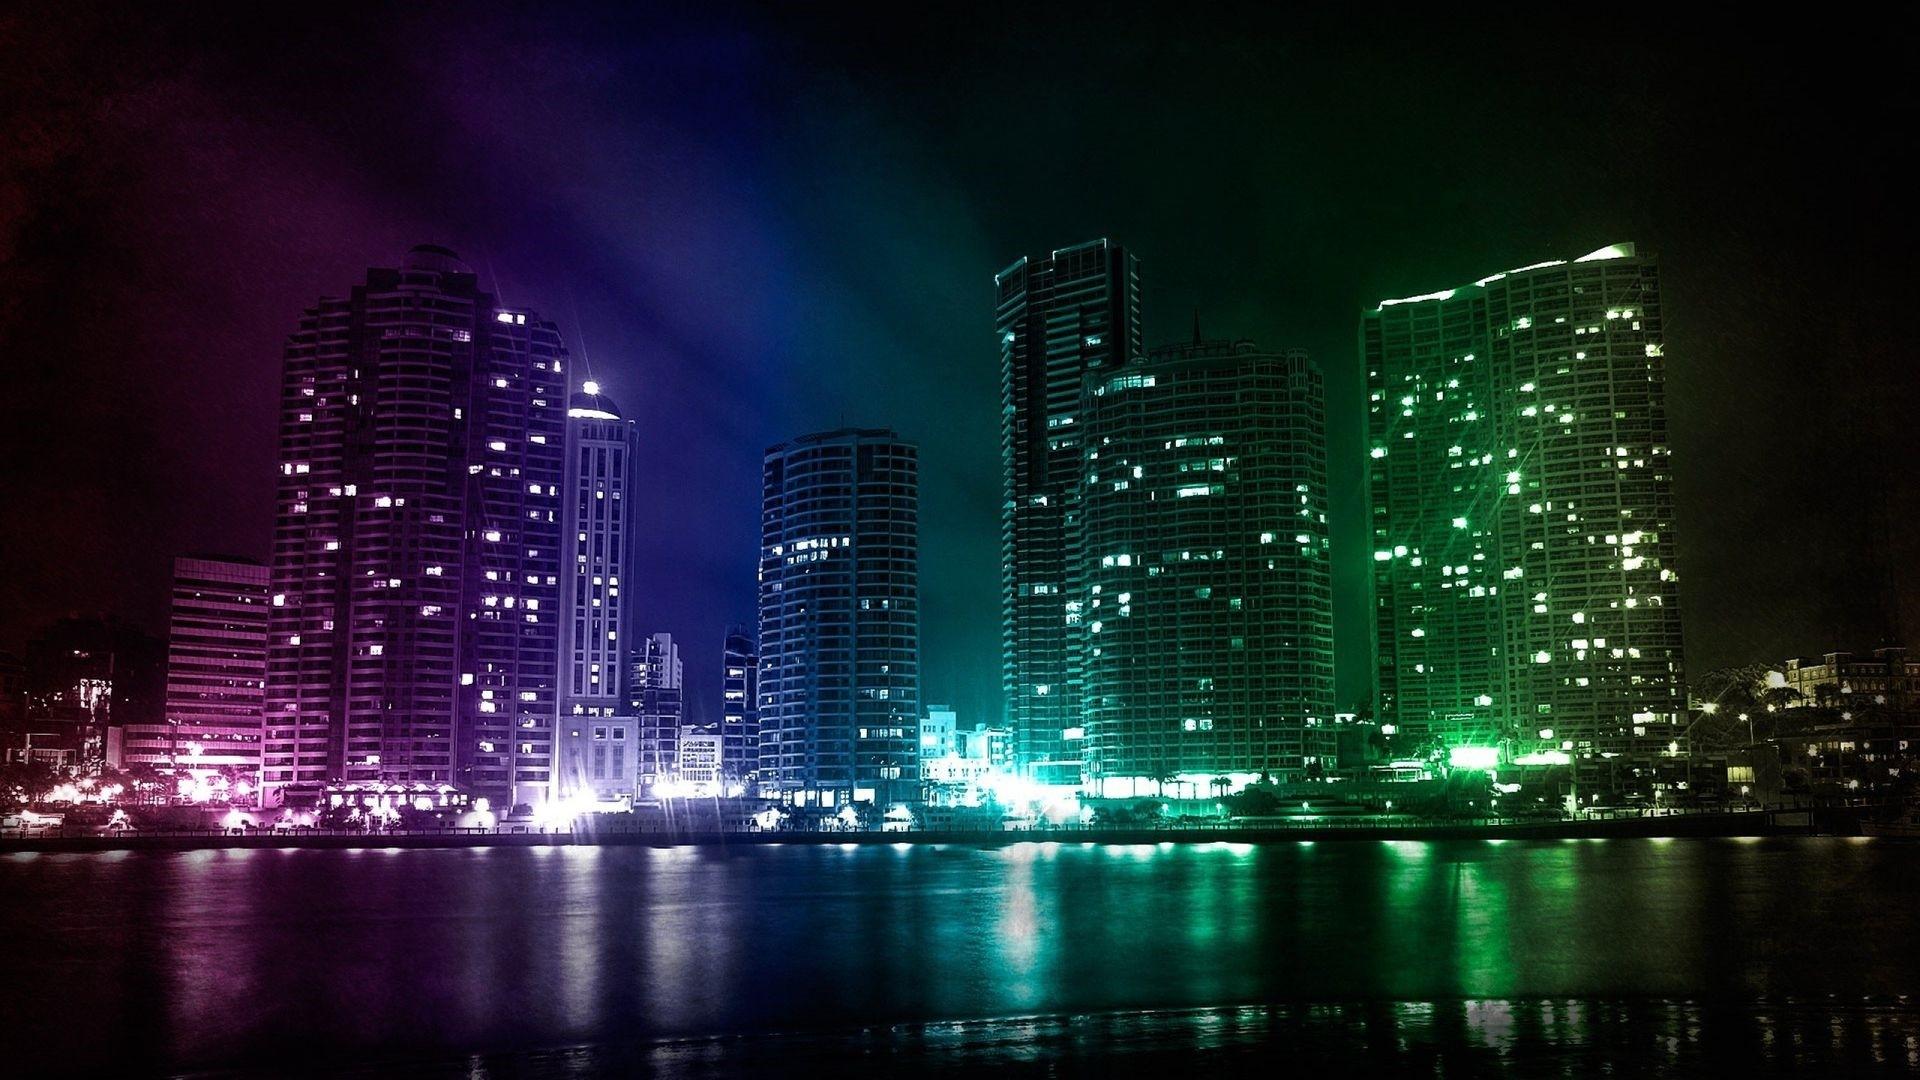 Neon City PC Wallpaper HD